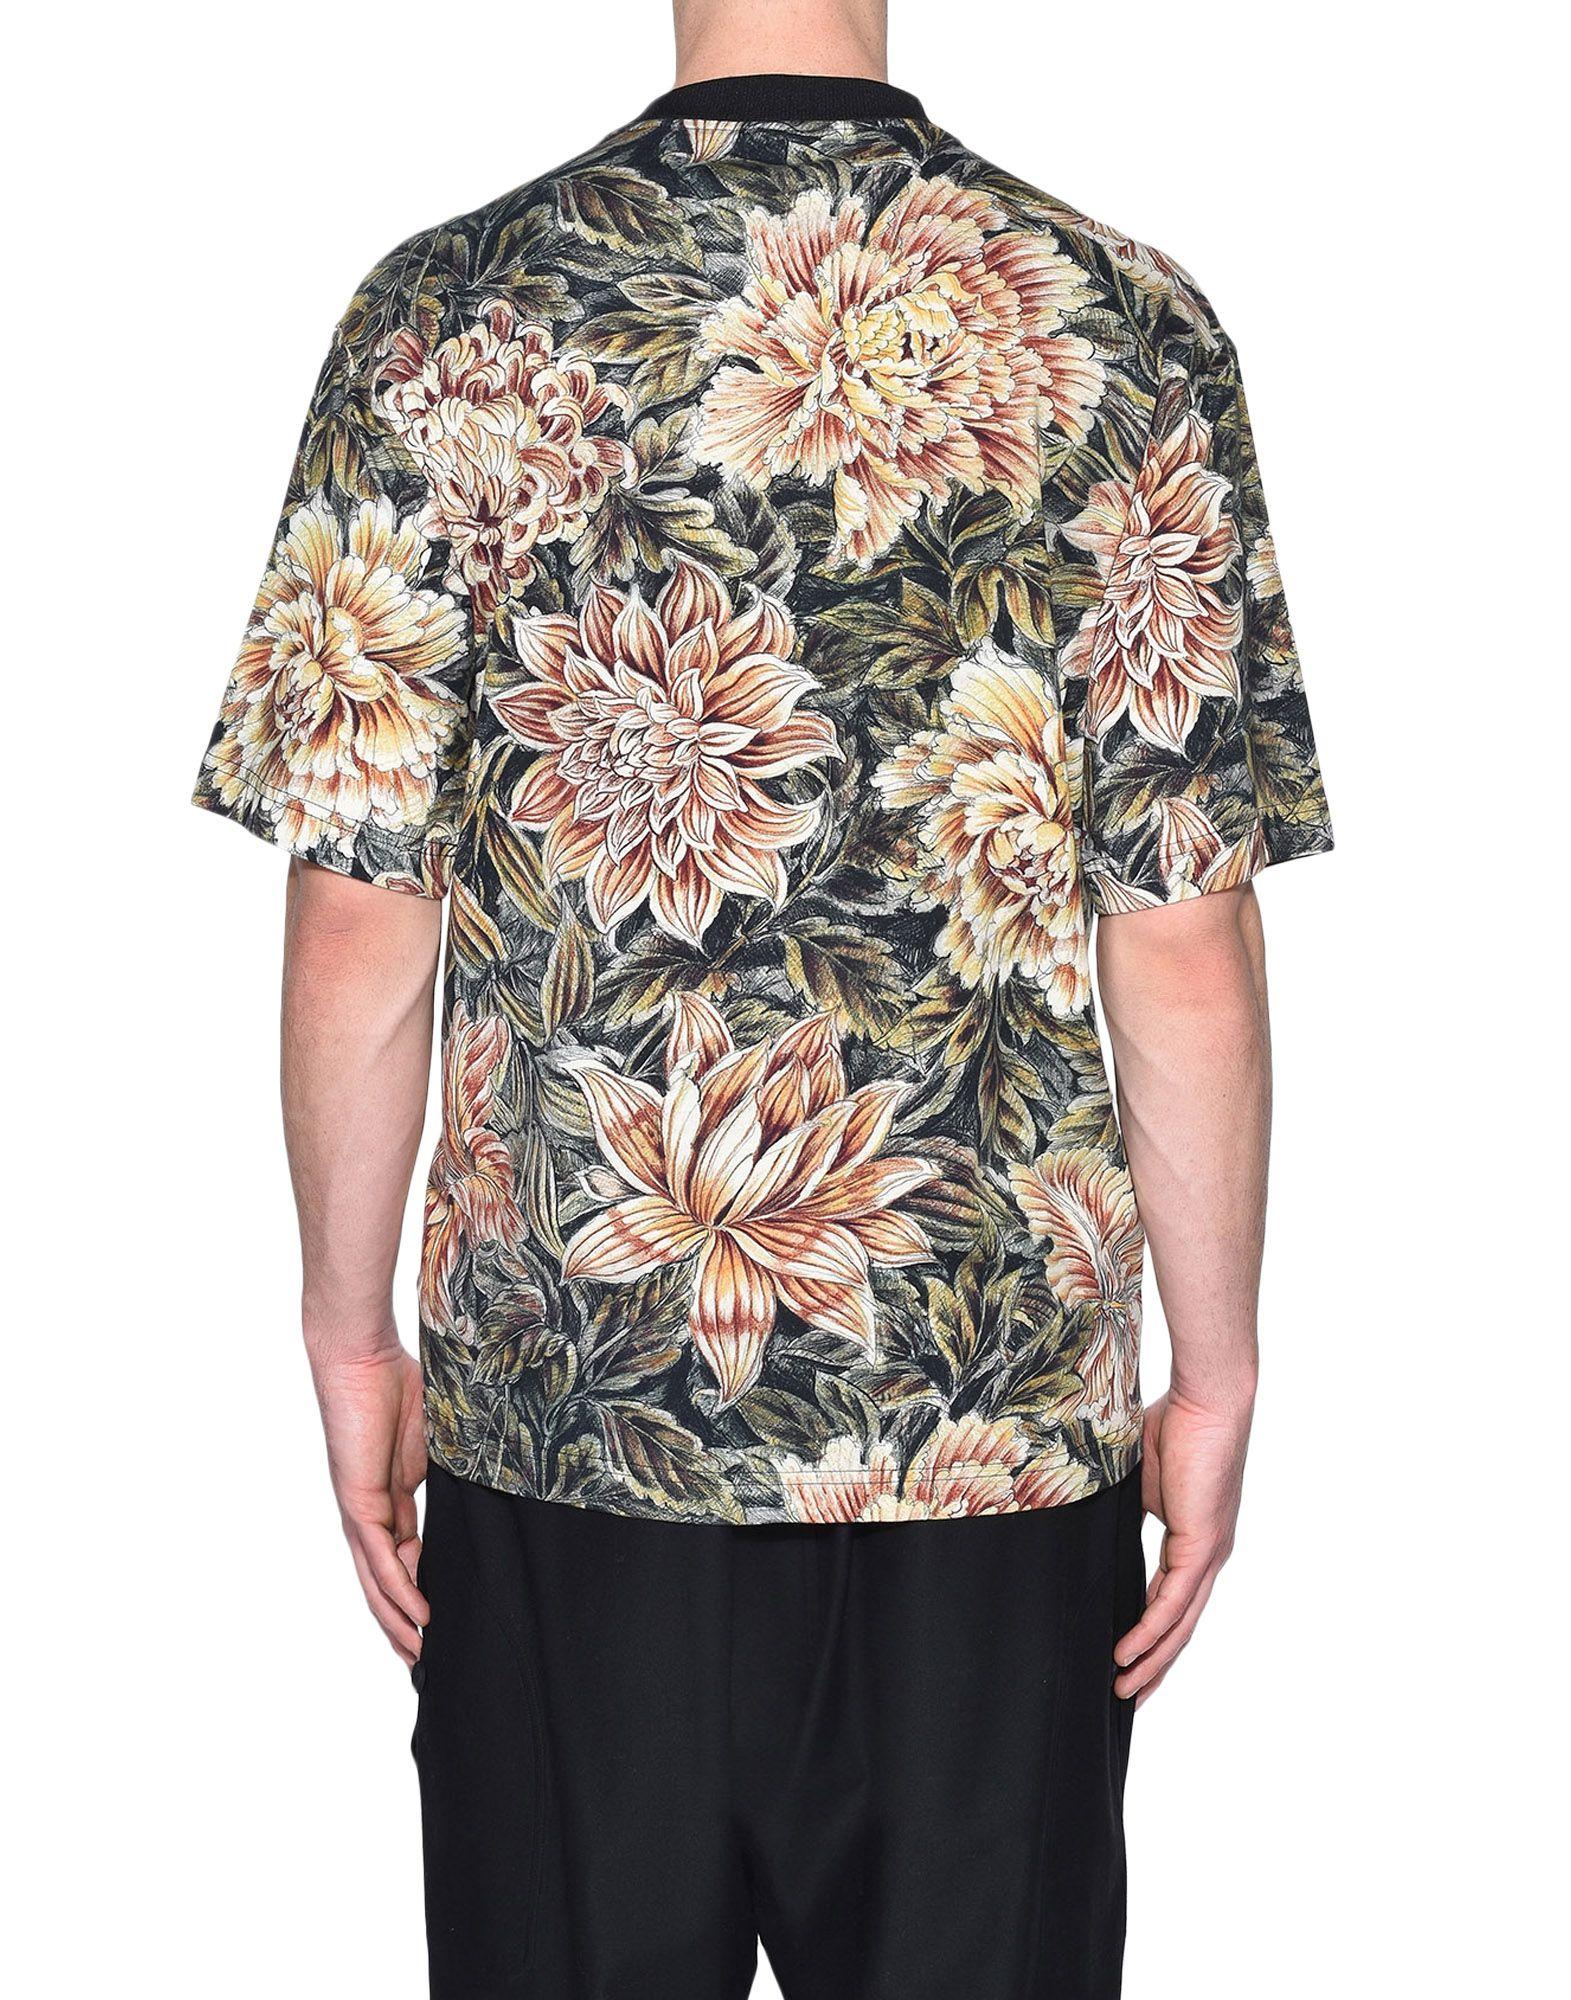 Y-3 Y-3 AOP High Neck Tee Short sleeve t-shirt Man d